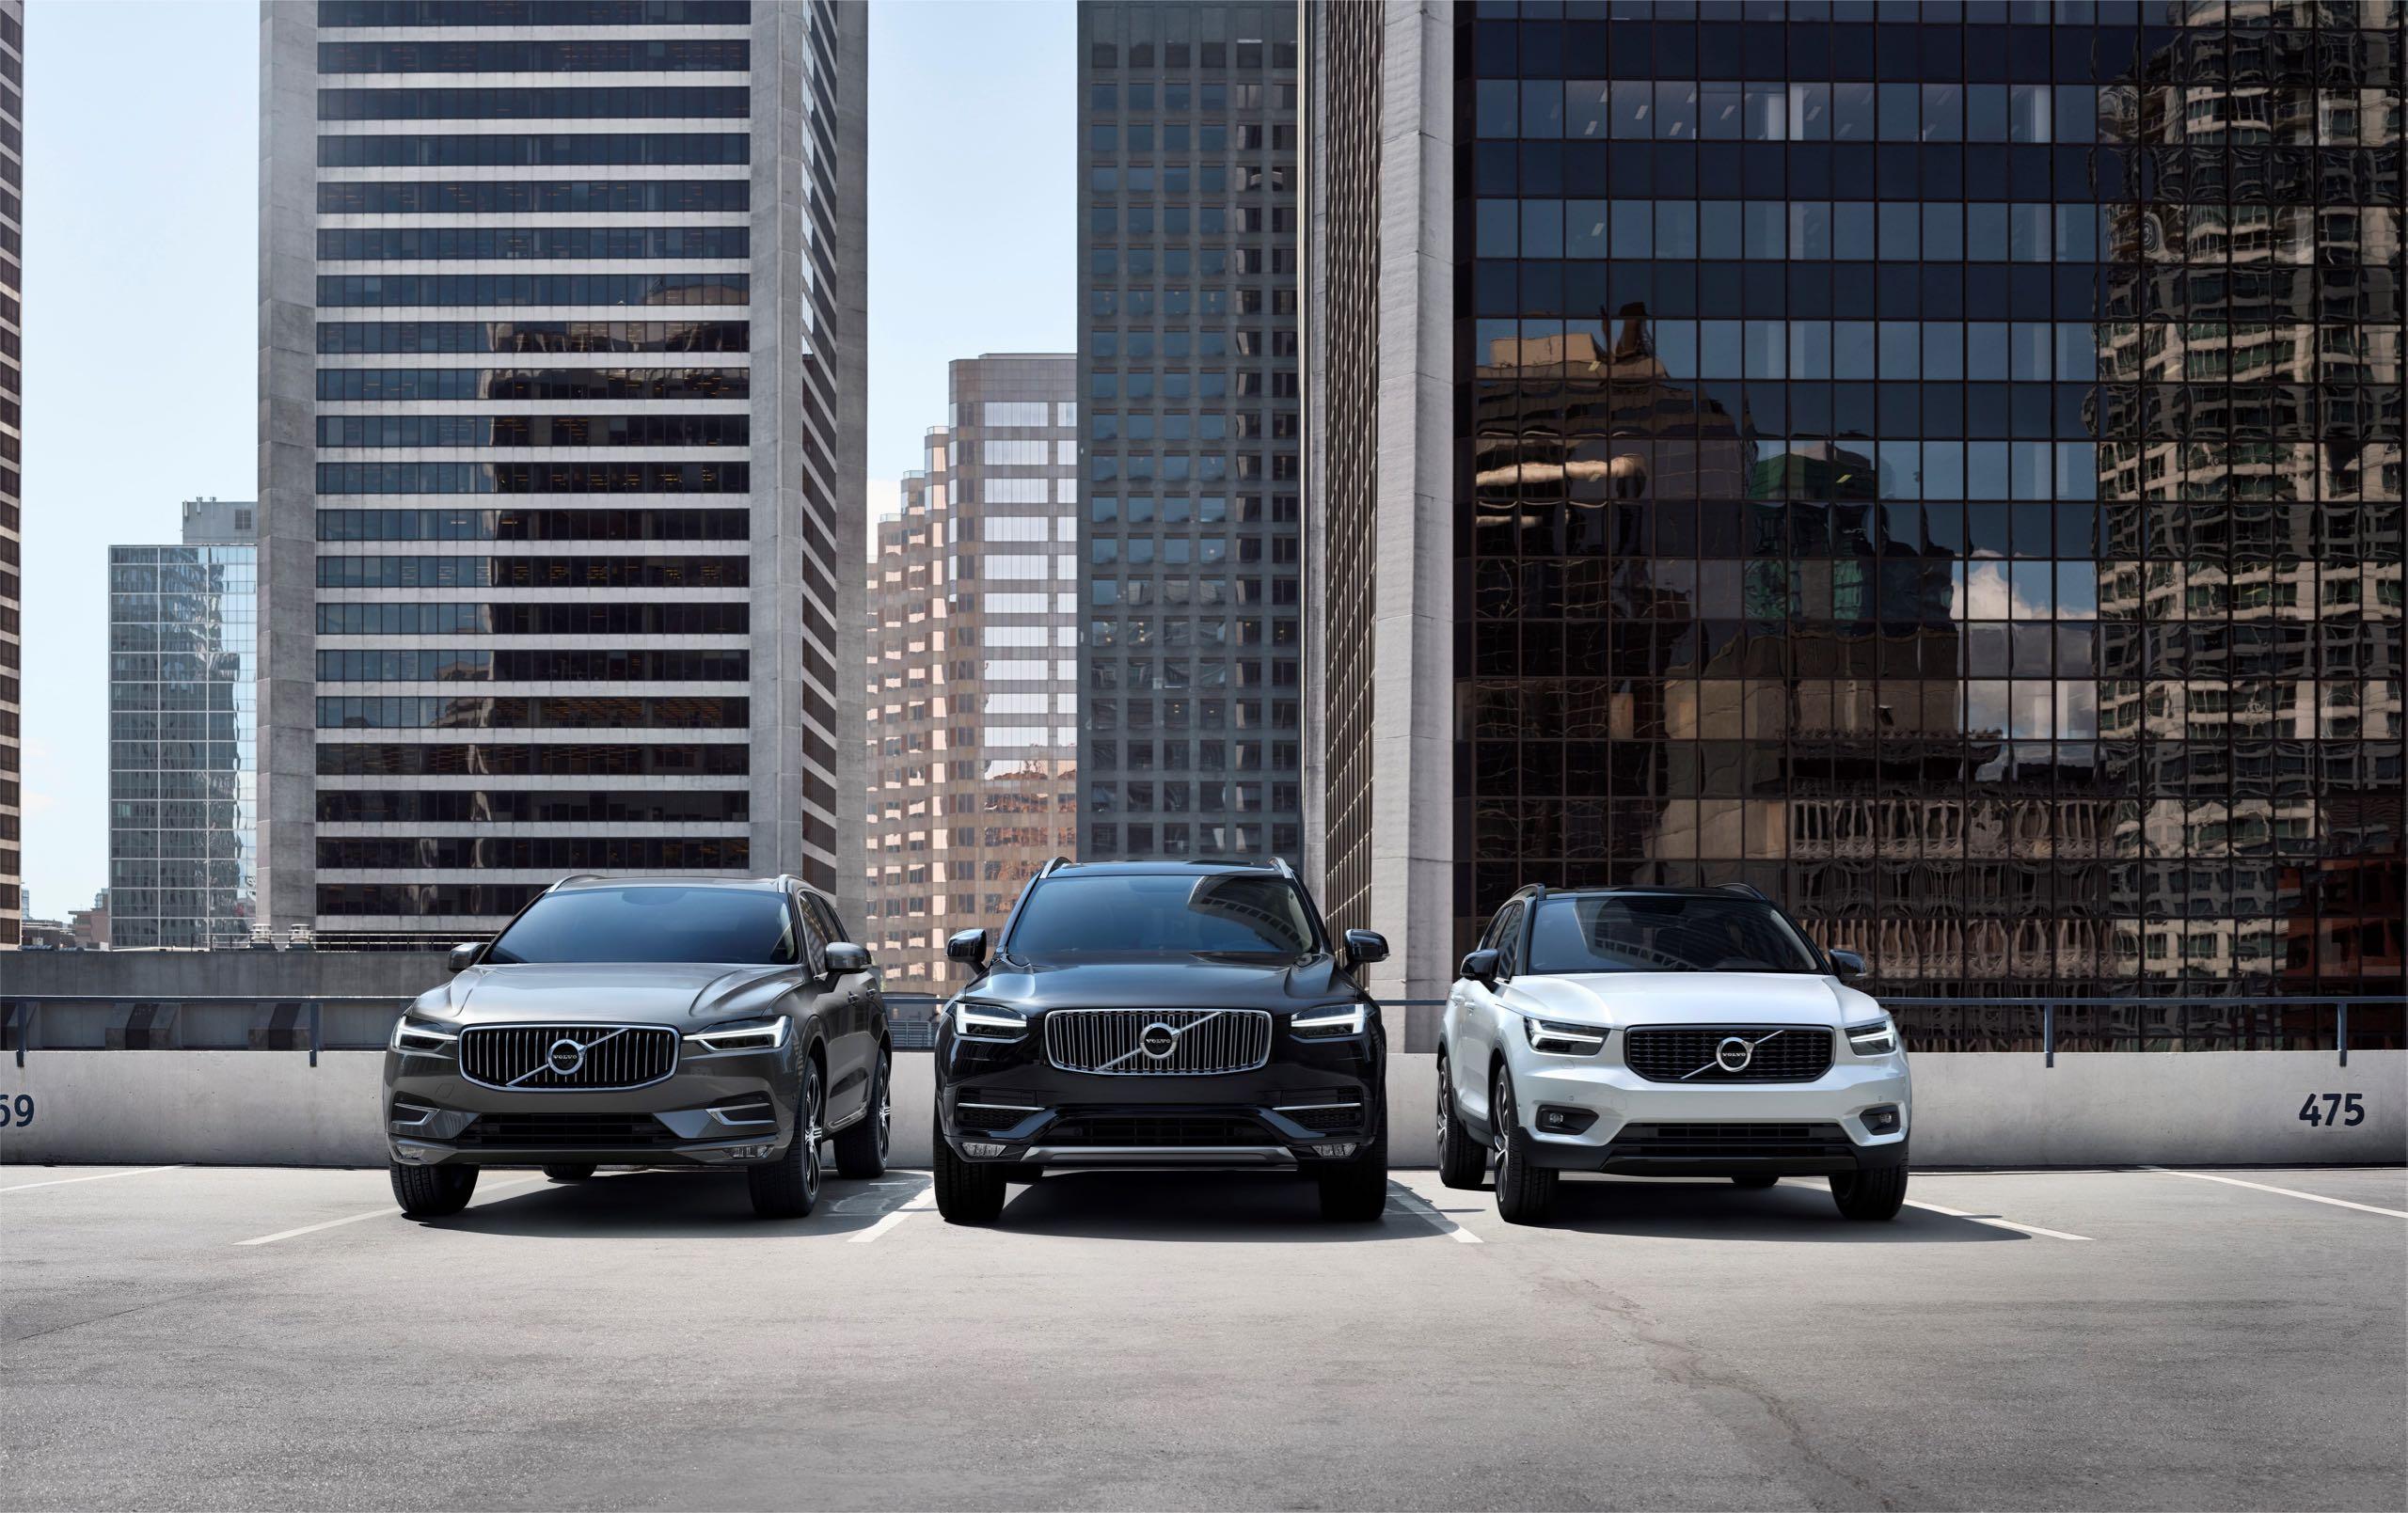 Volvo Cars' Suv Line Up -  2018, 2018 New XC40, 2018 New XC60, 2018 XC90, Exterior, Images, New XC40, New XC60, XC90